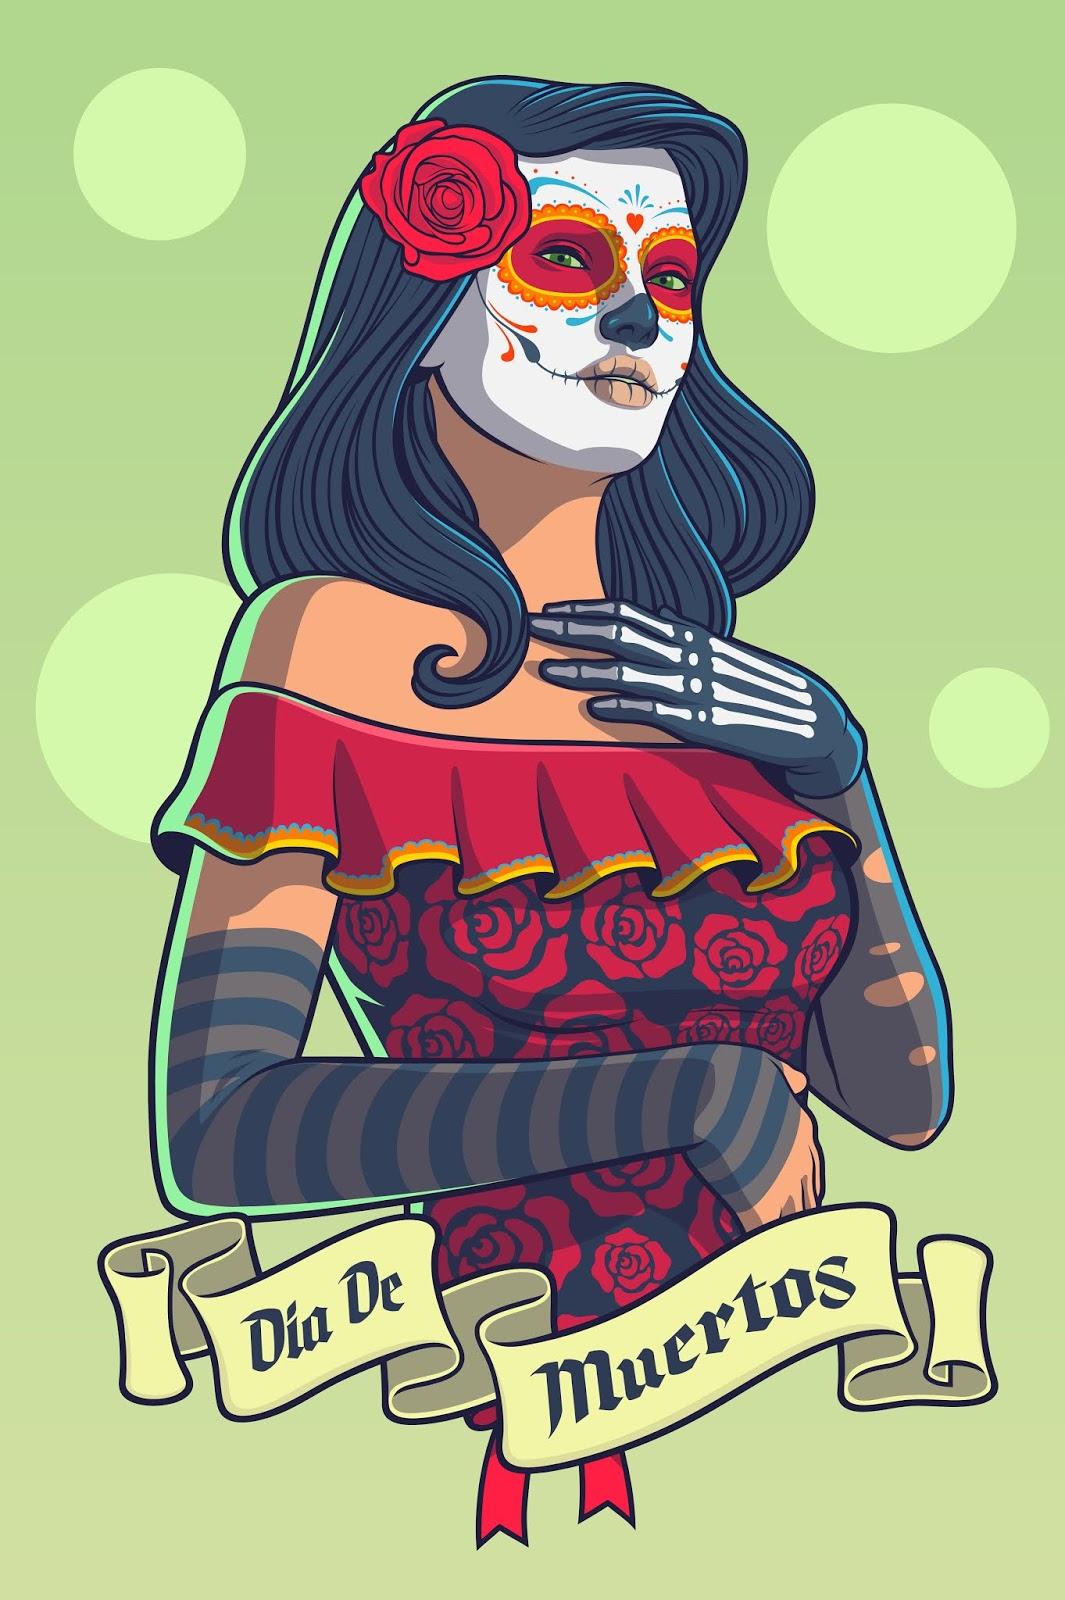 Dia De Los Muertos Lady Catrina Dress Free Download Vector CDR, AI, EPS and PNG Formats